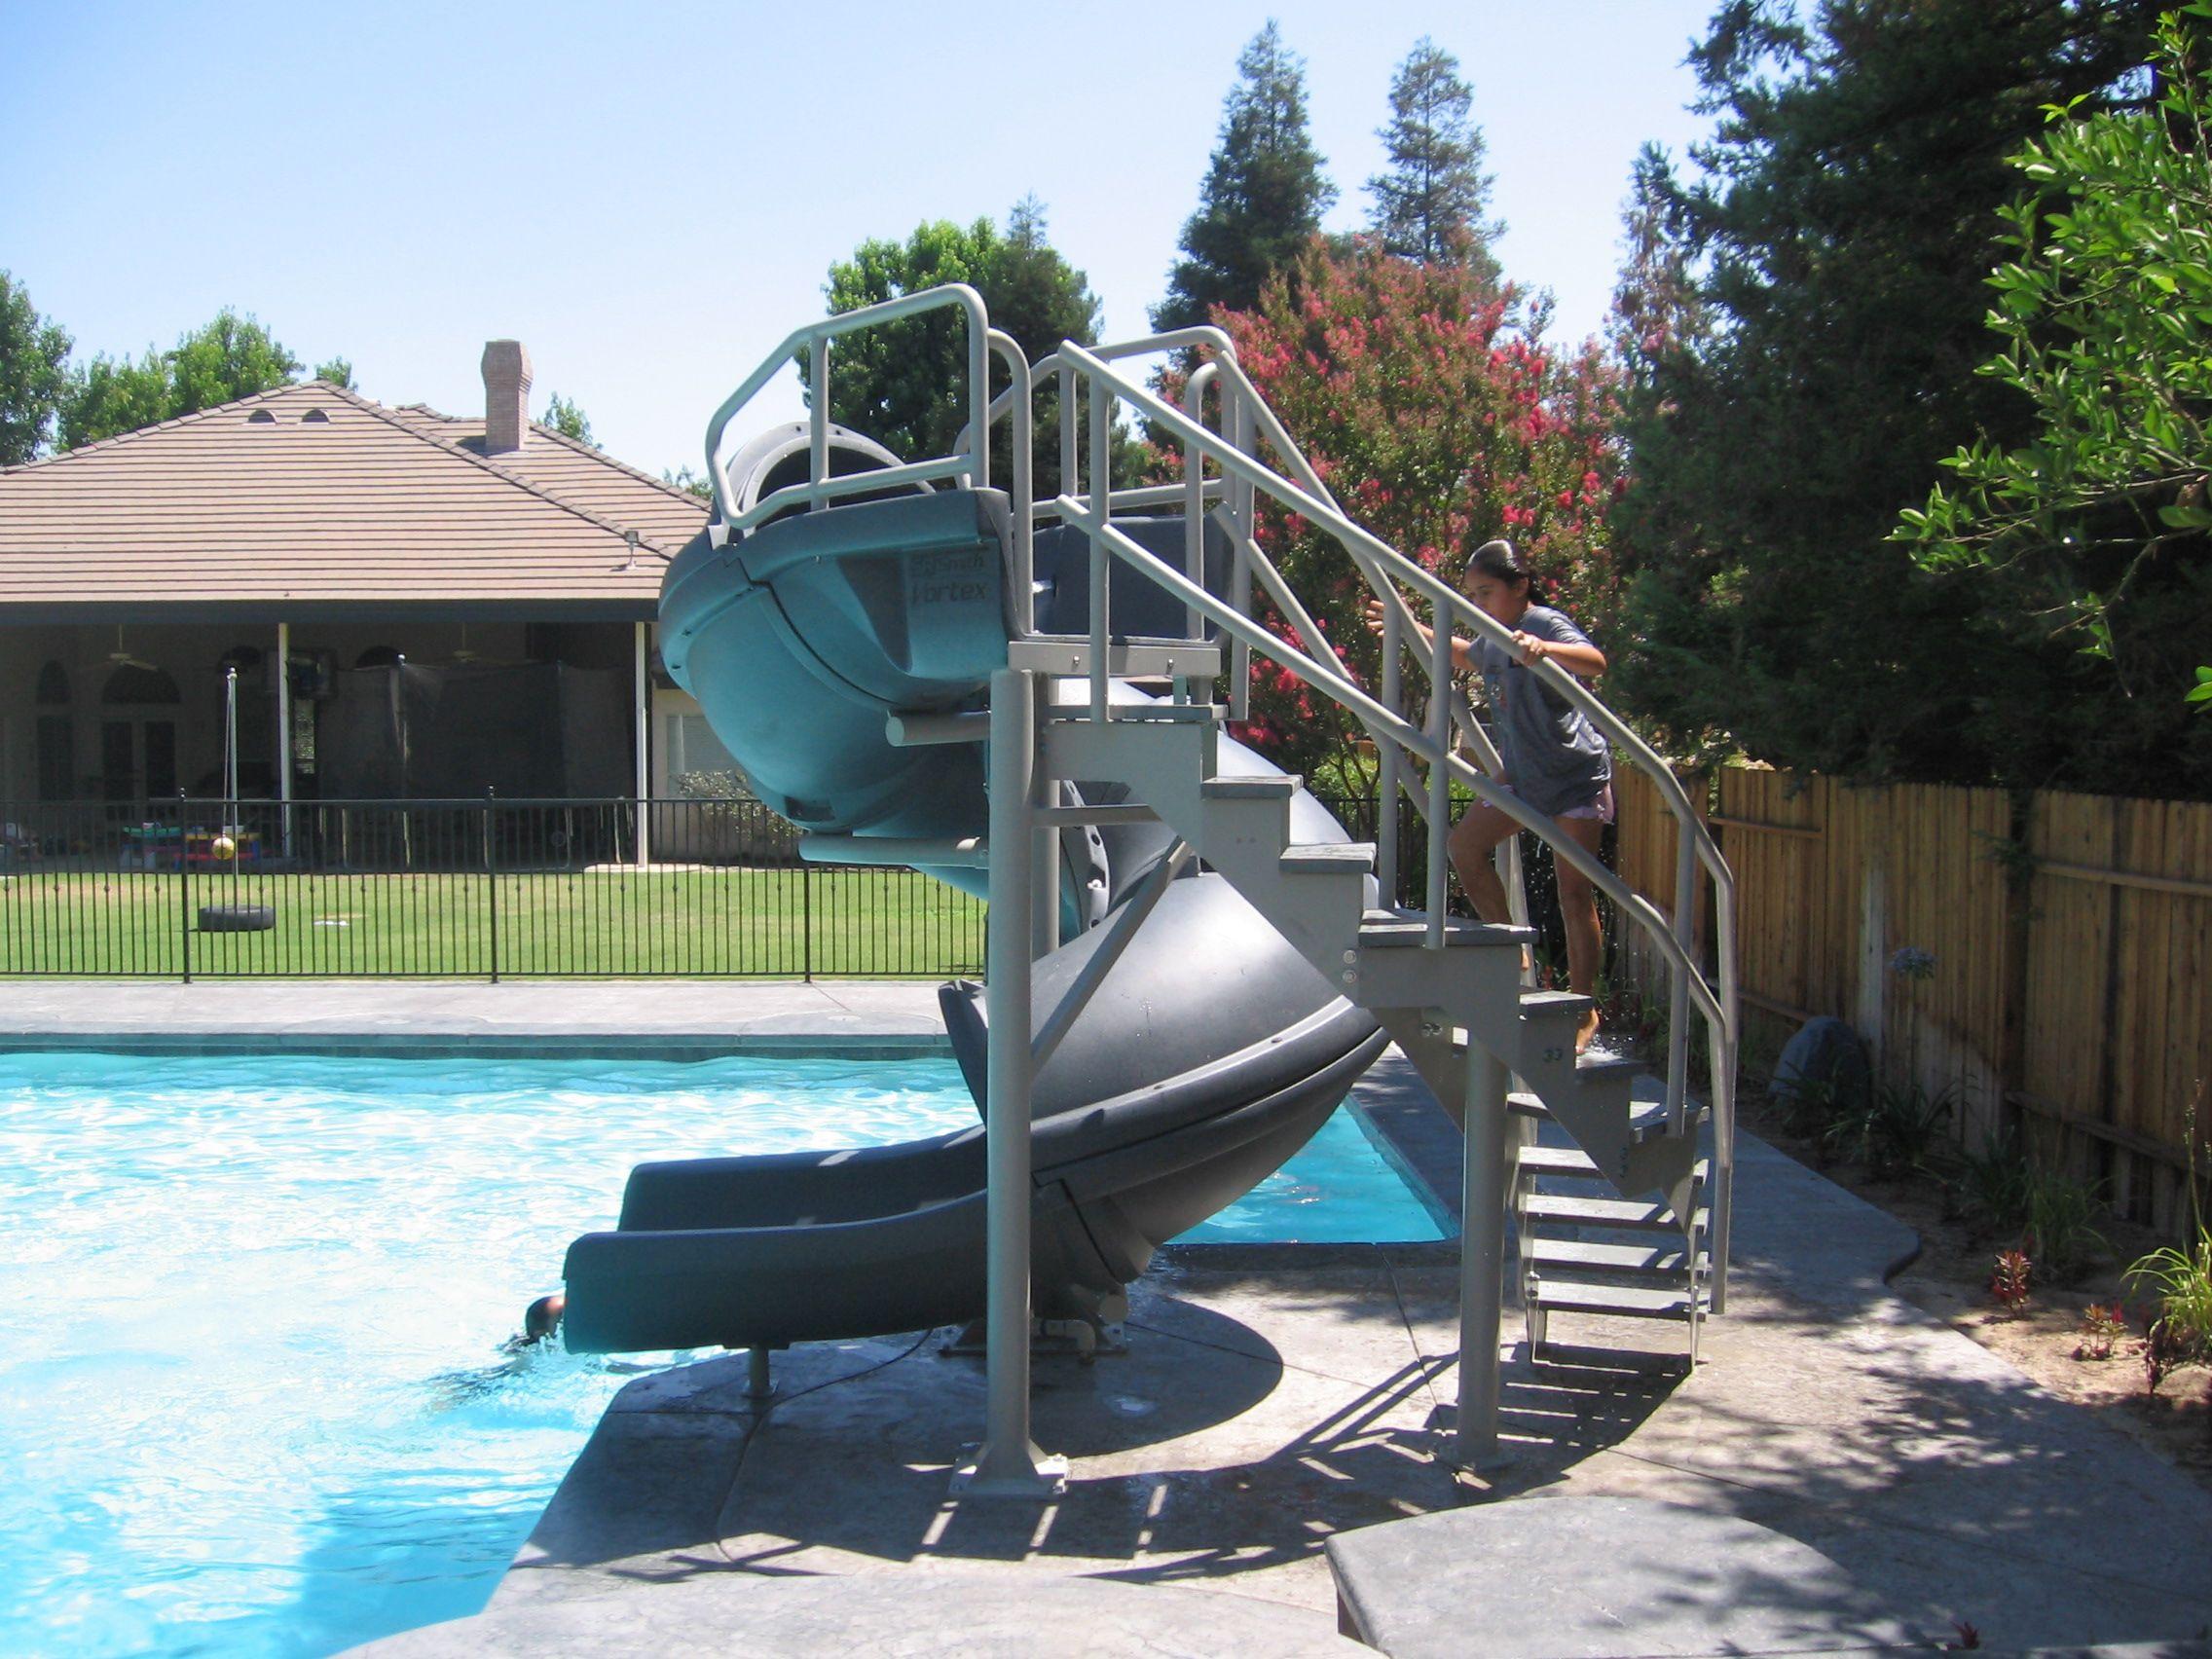 Vortex Inground Pool Slide Half Tube And Staircase Gray Granite Pool Supplies Canada Inground Pool Slides Swimming Pool Slides Modern Pools